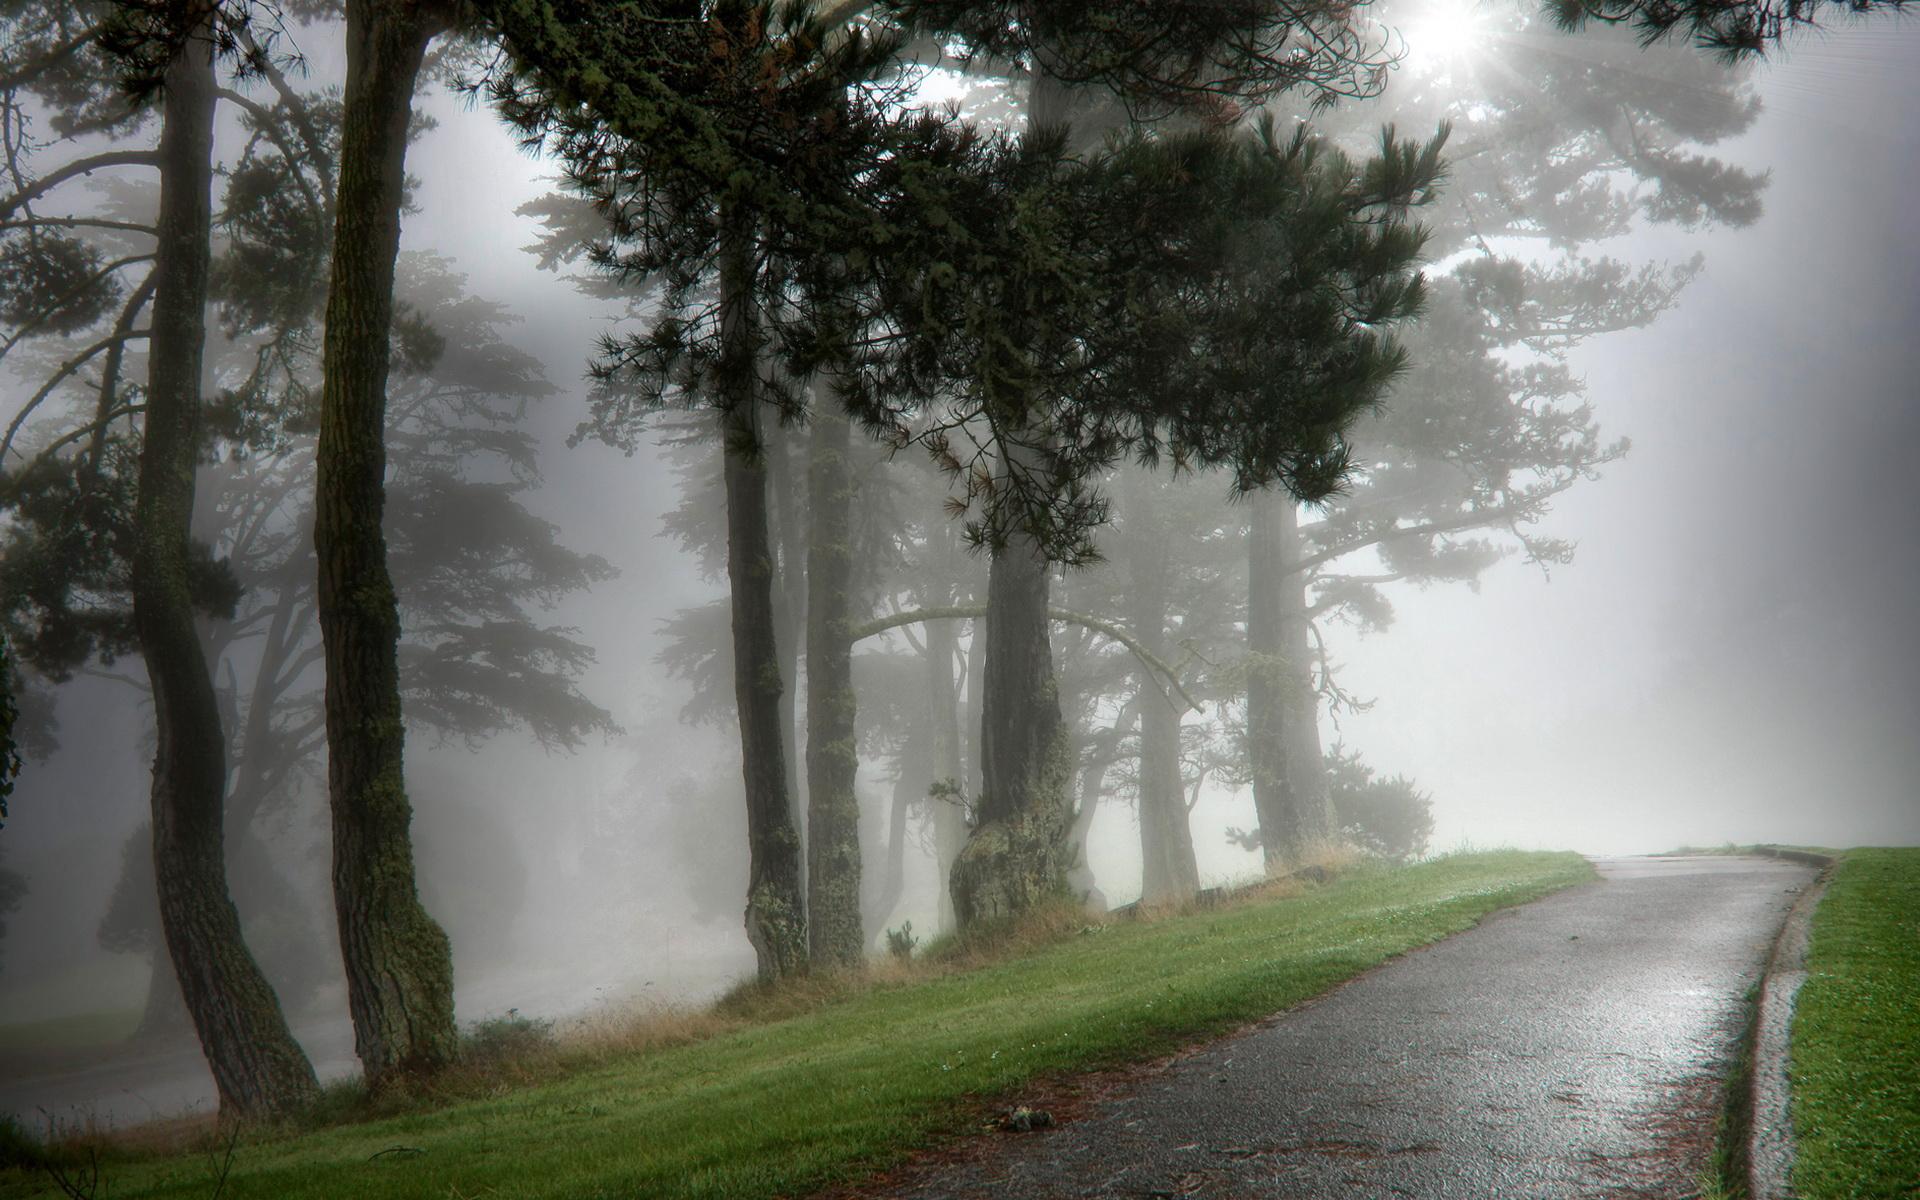 ... Best Wallpapers HD; Fog Wallpapers